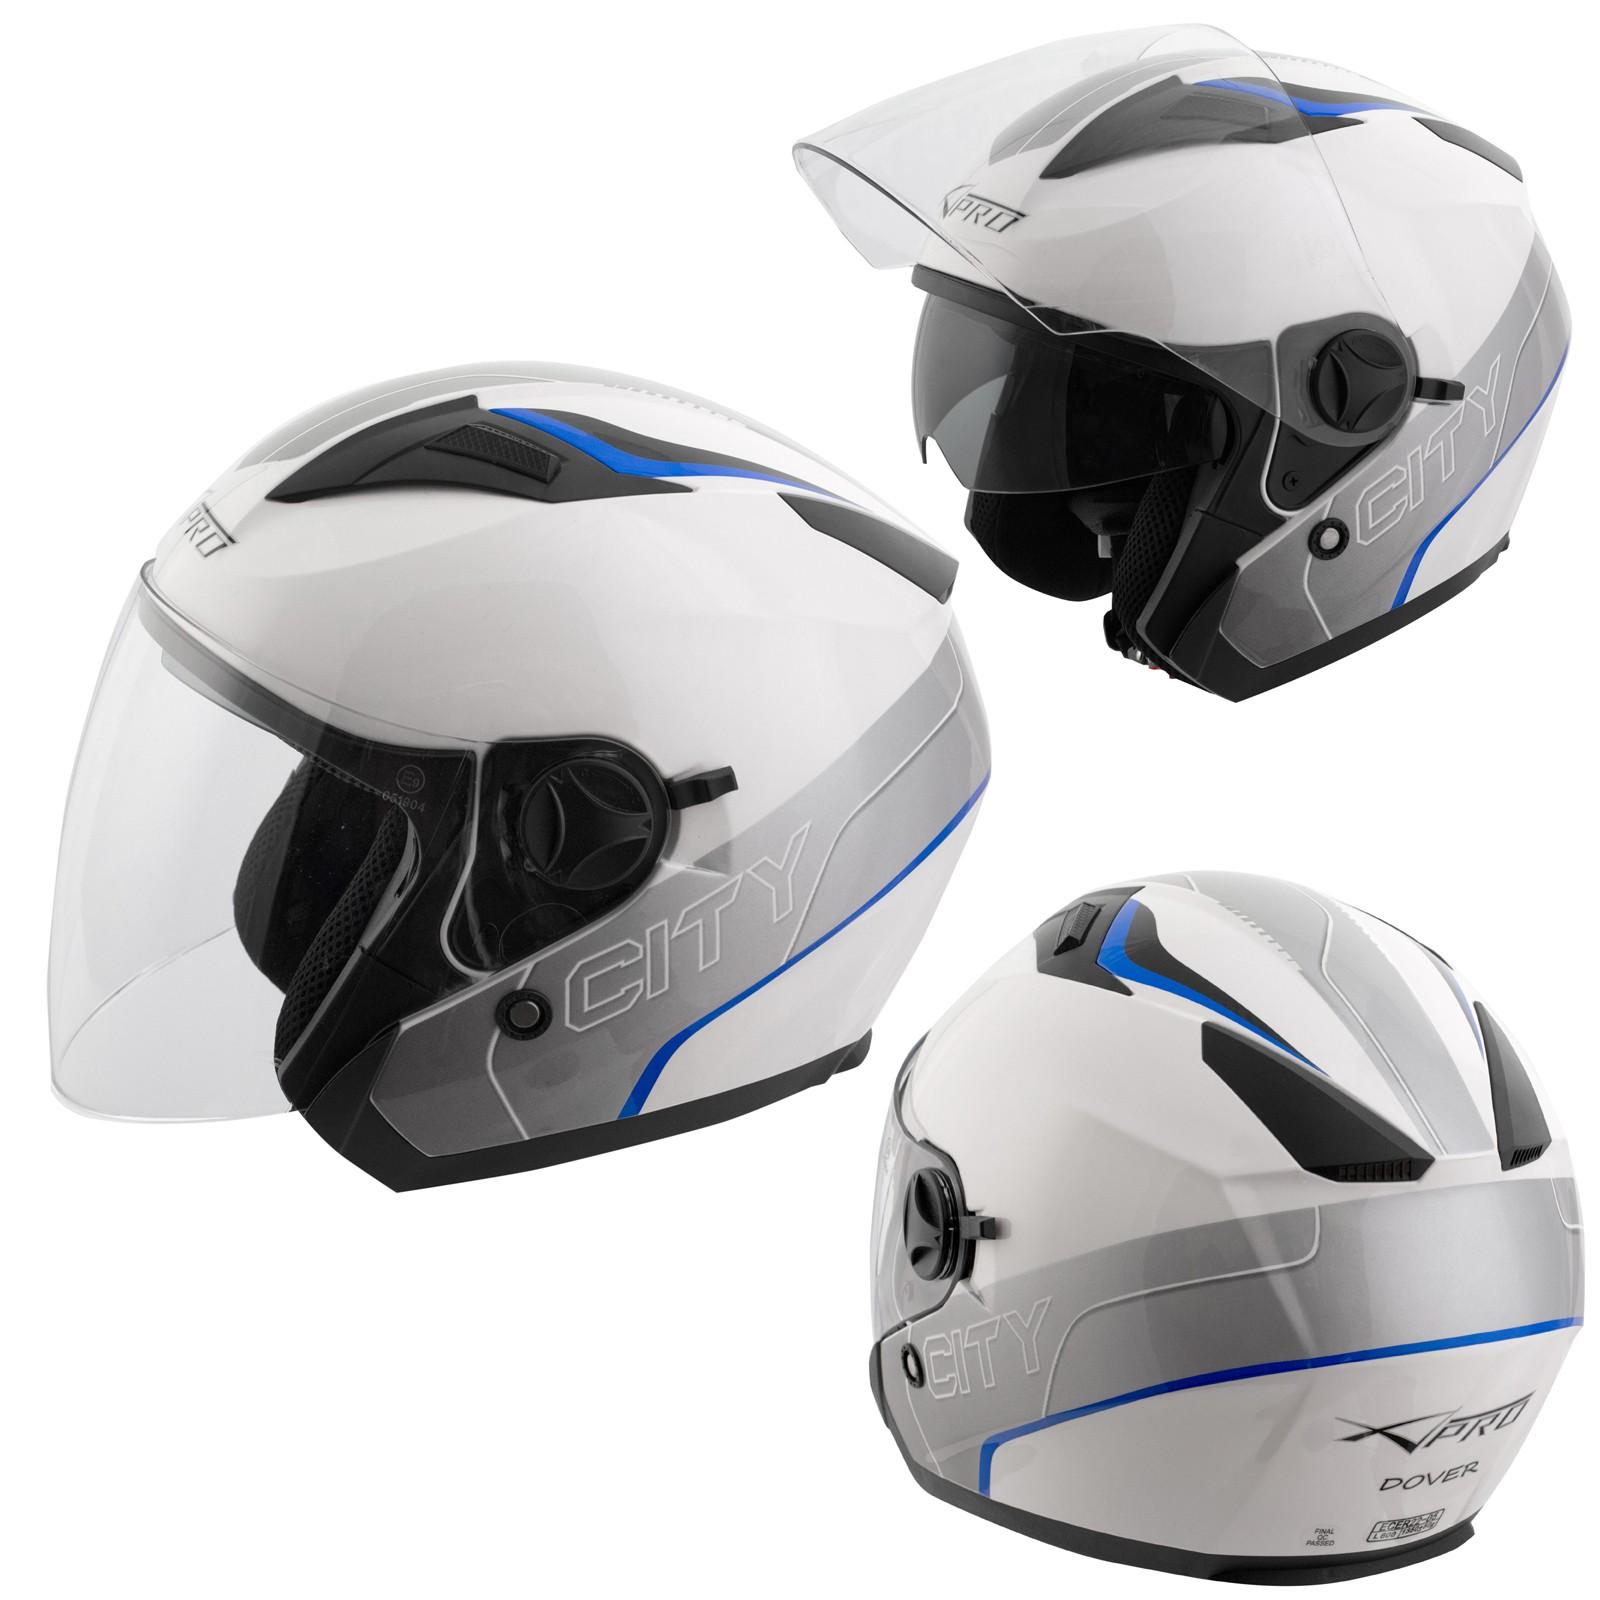 ec2403a345486 Dover Casco Helmet Moto Motorcycle OpenFace Jet Size. Casco Jet Helmet Scooter  Moto Homologado Ciudad Parasol Visor Blau. 50% OFF